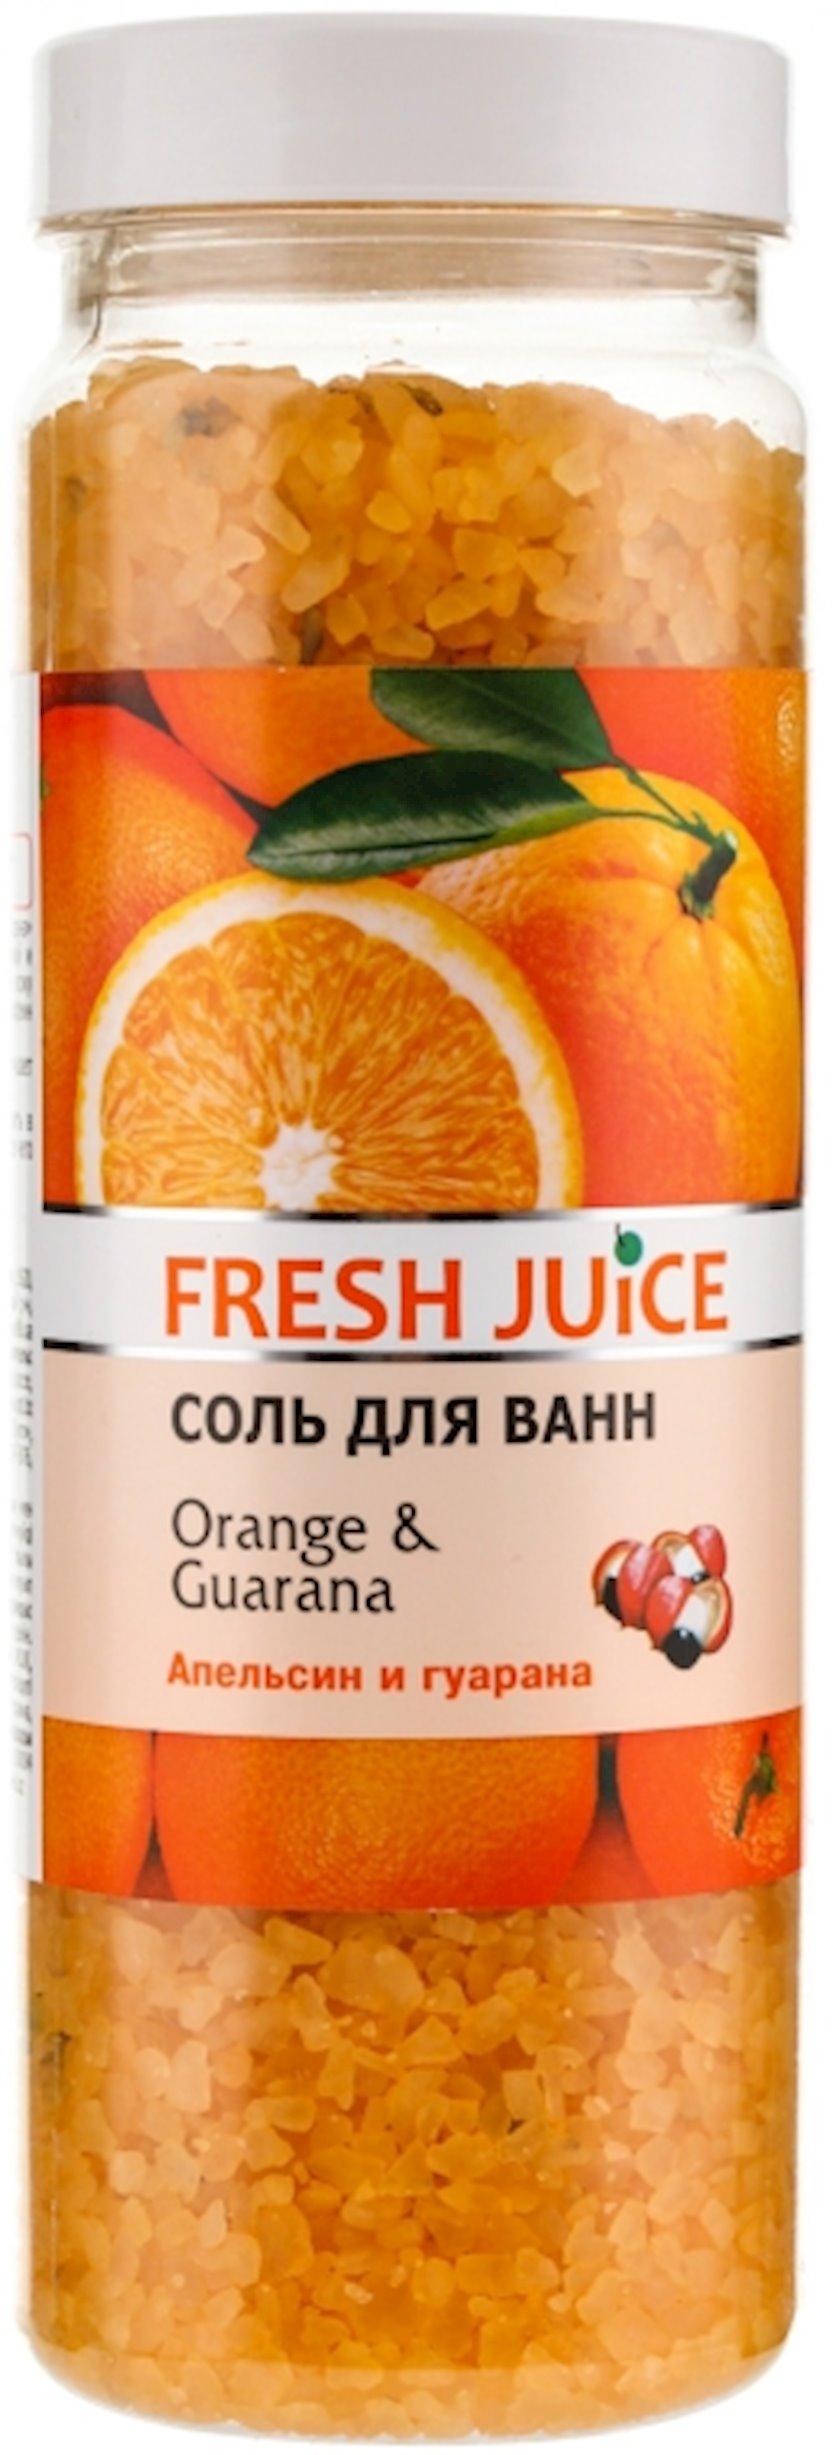 Vanna üçün duz Fresh Juice Orange & Guarana 700 qr